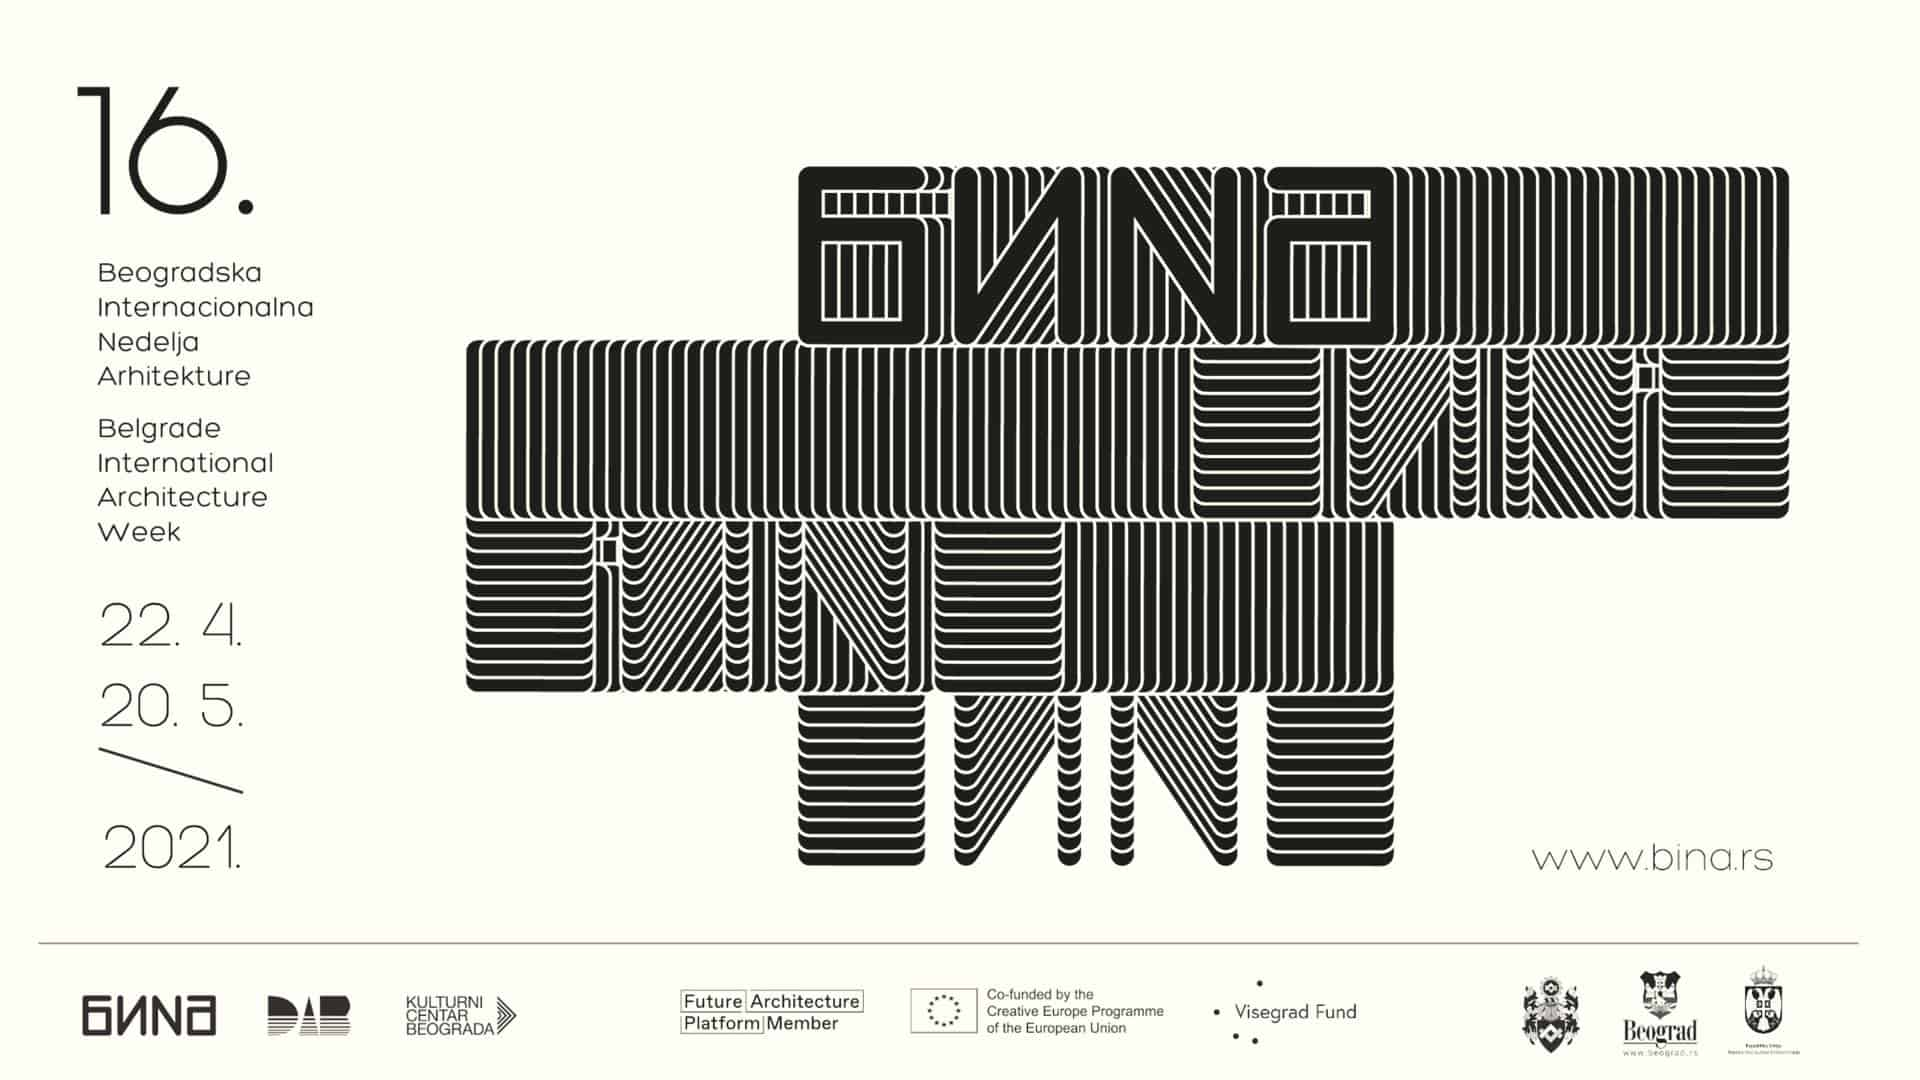 Beogradska internecionalna nedelja arhitekture